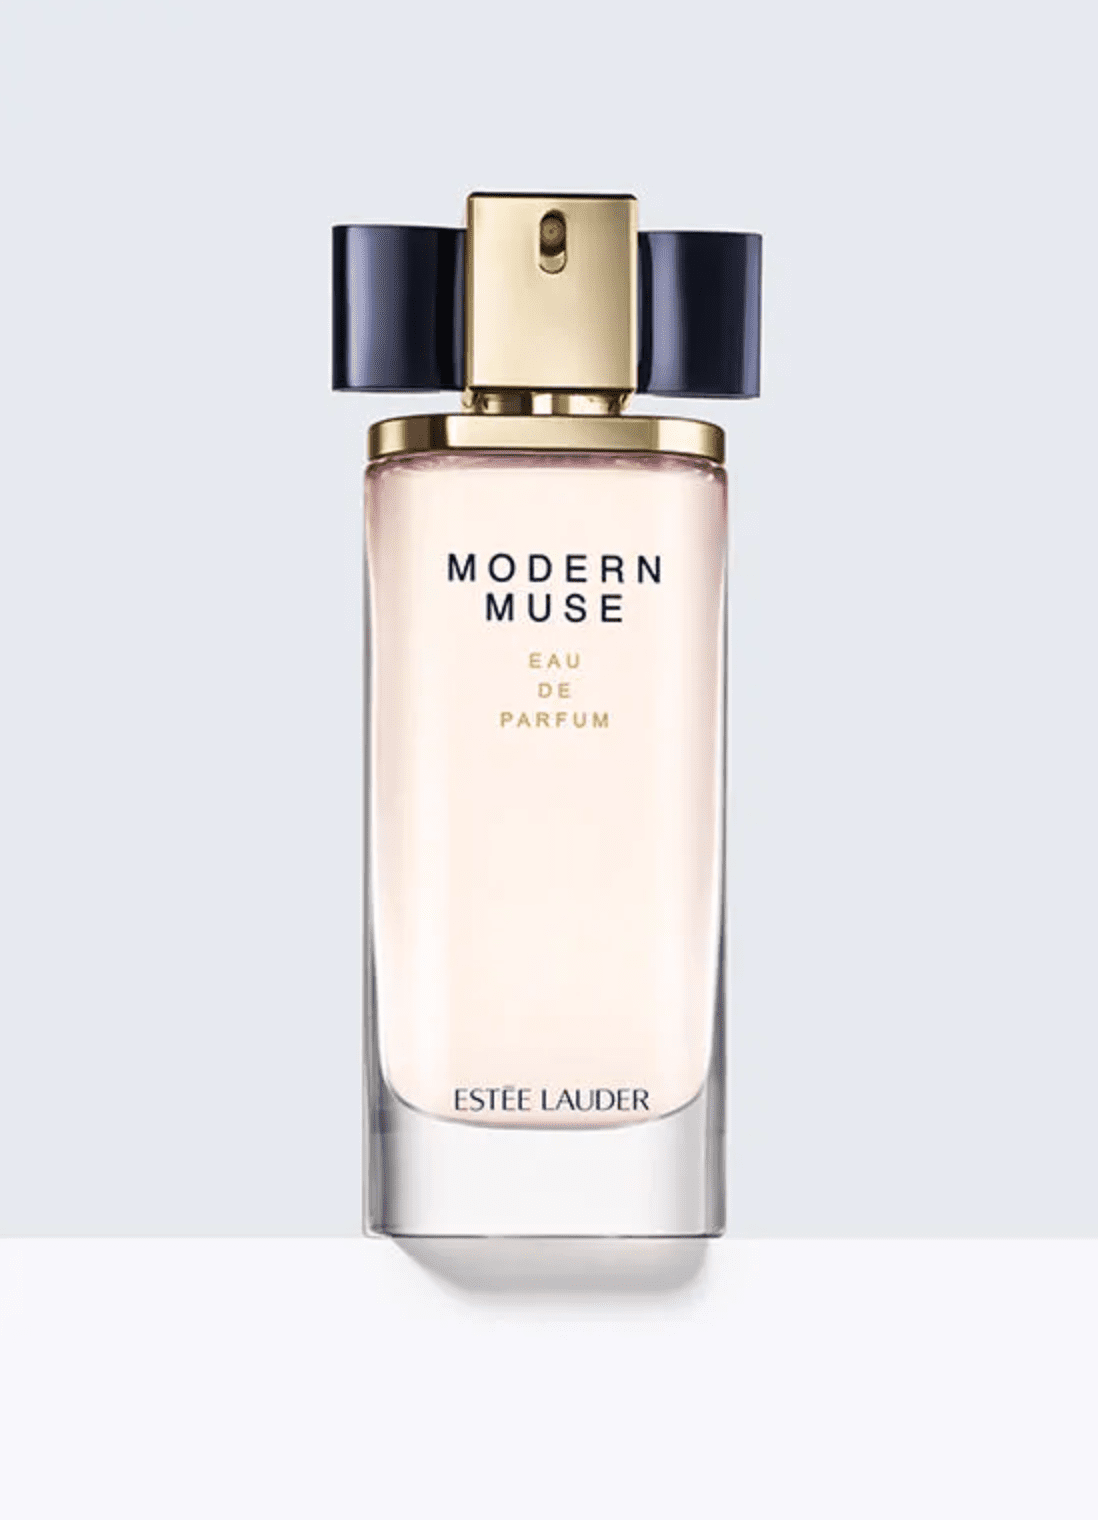 Estee Lauder Modern Muse Perfume